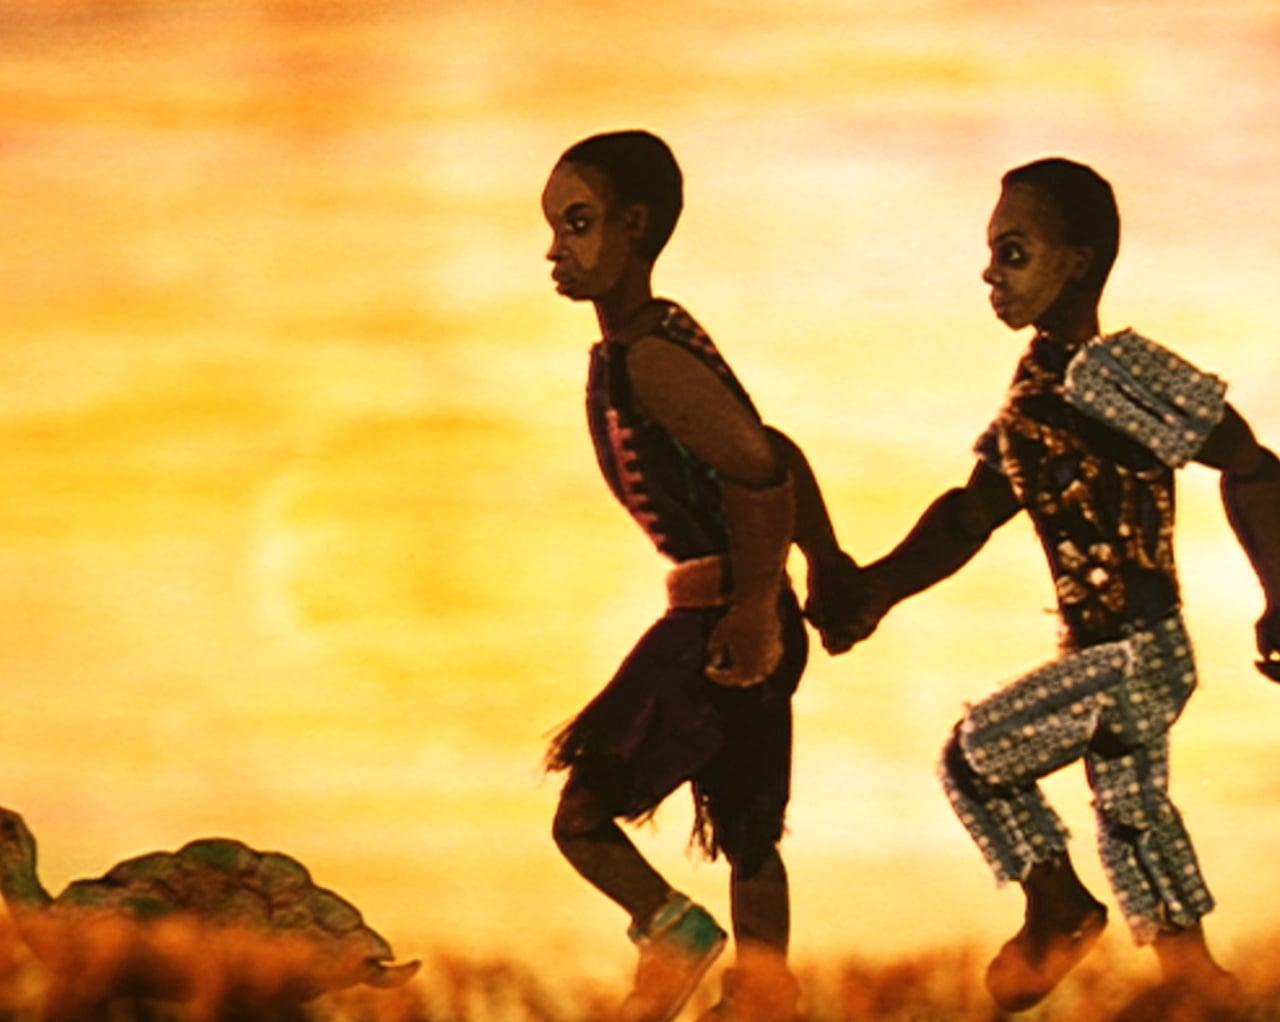 L'animation indépendante africaine 5 films – Jean-Michel Kibushi Ndjate Wooto